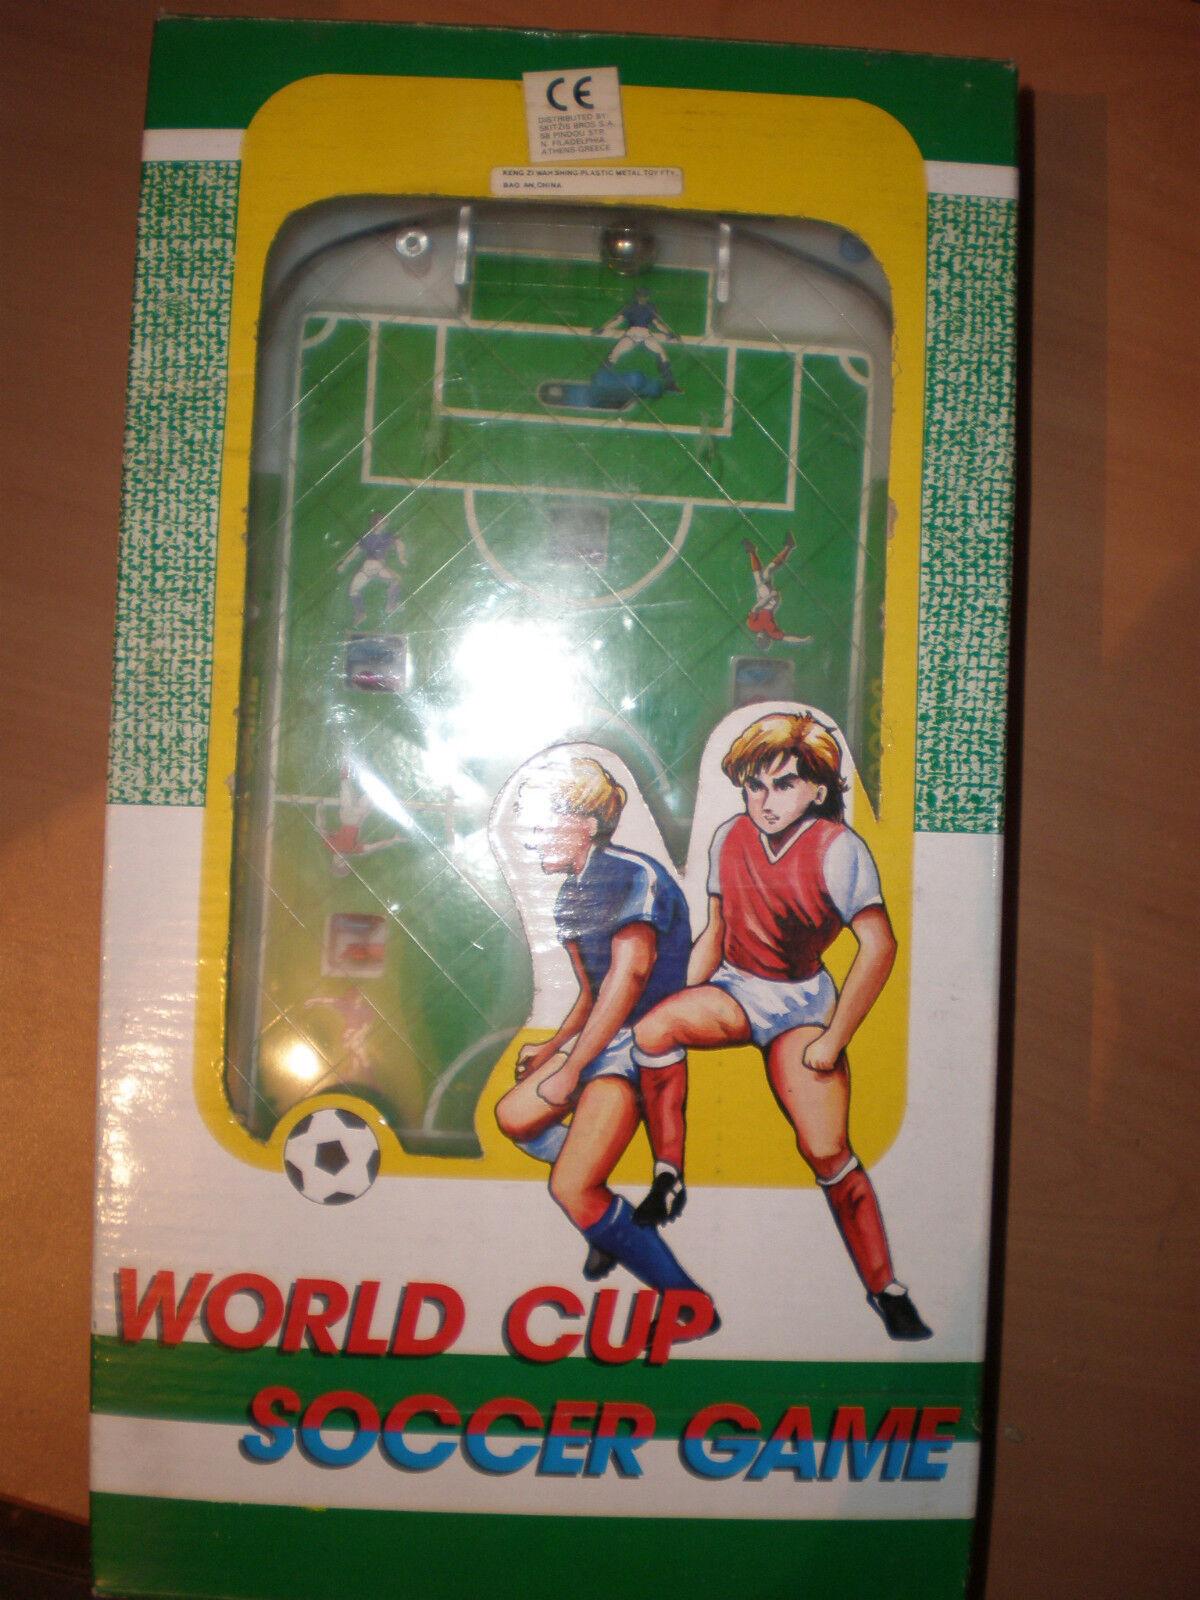 80'S VINTAGE BALANCE SKILL WORLDCUP SOCCER gioco PINBtutti  LIKE MINT MIB  qualità ufficiale